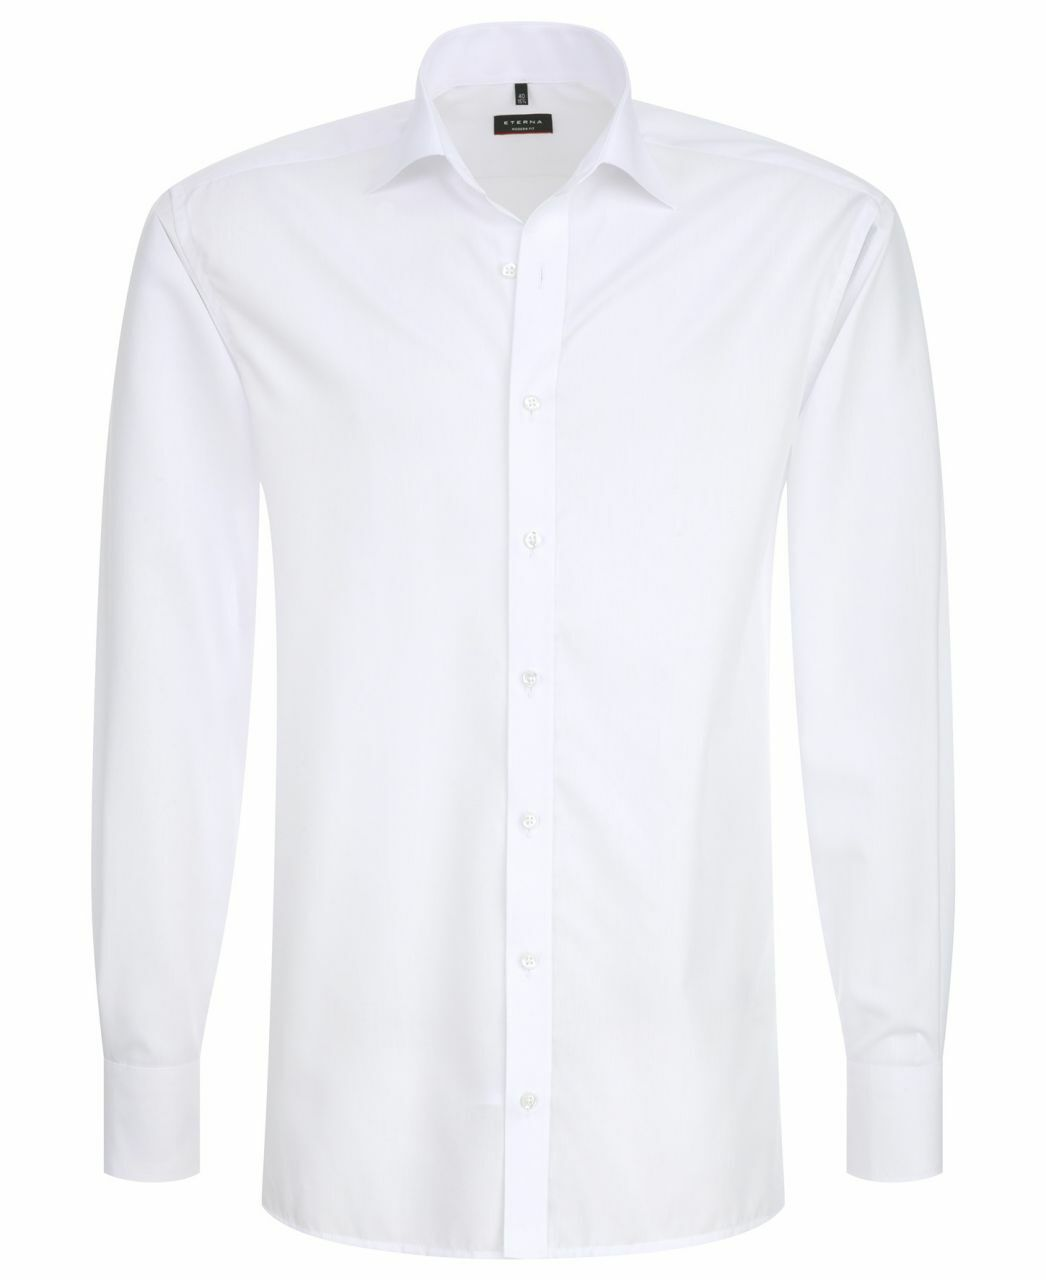 Eterna-Modern Fit-perchas libre señores super-camisa super-camisa super-camisa manga larga (72cm) (1100 x177) c0326c